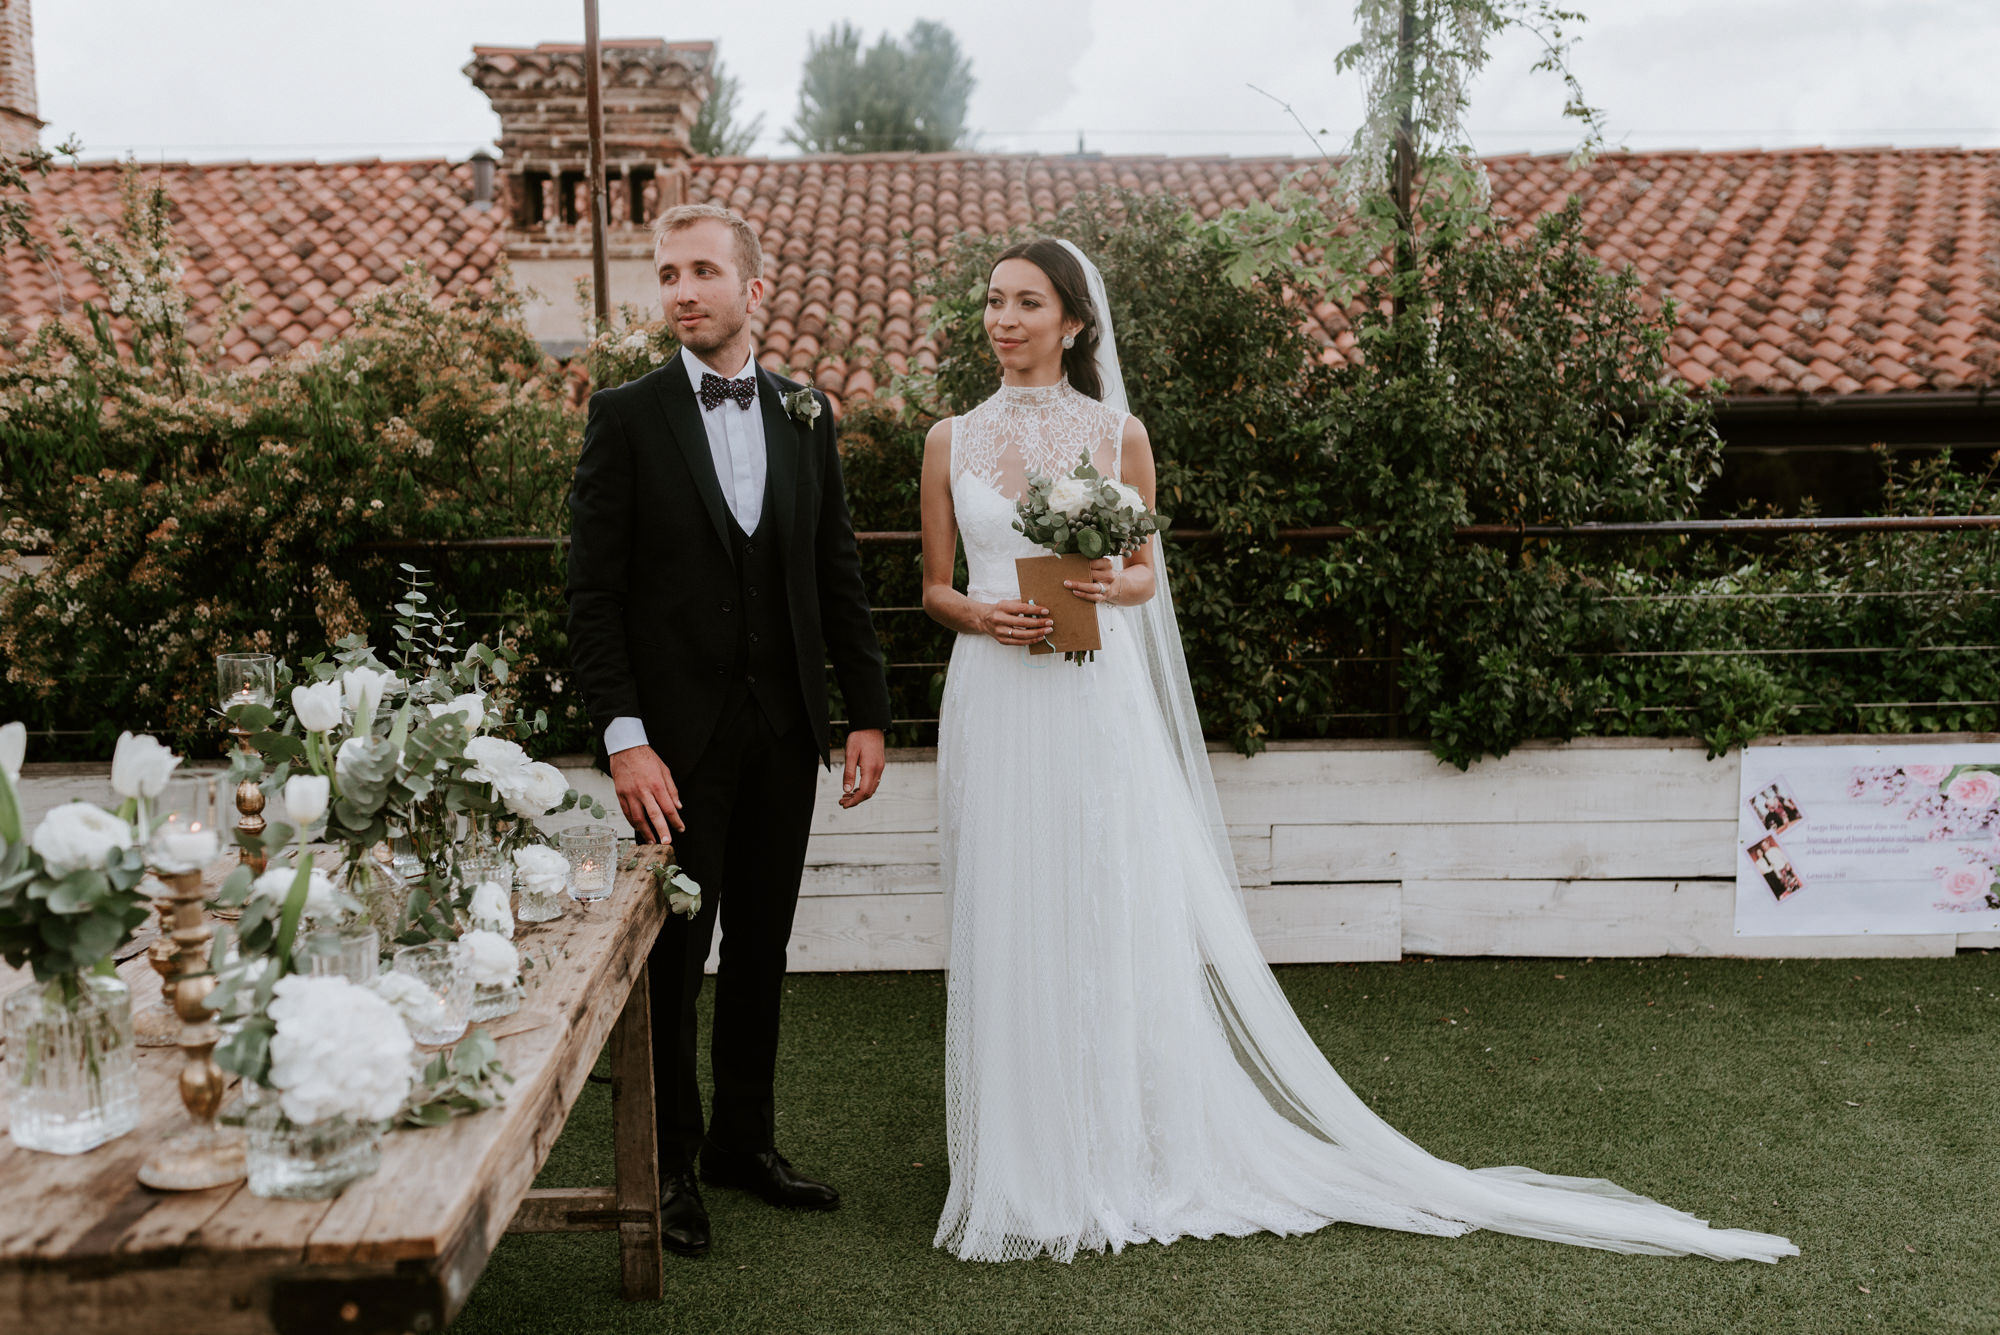 FOTO+PHOTO+BODA+WEDDING+ITALIA+ITALY+MAURICIO+GARAY+MAURICIOGARAY+WEDDINPHOTOGRAPHER+FOTOGRAFODEBODA-1430.jpg